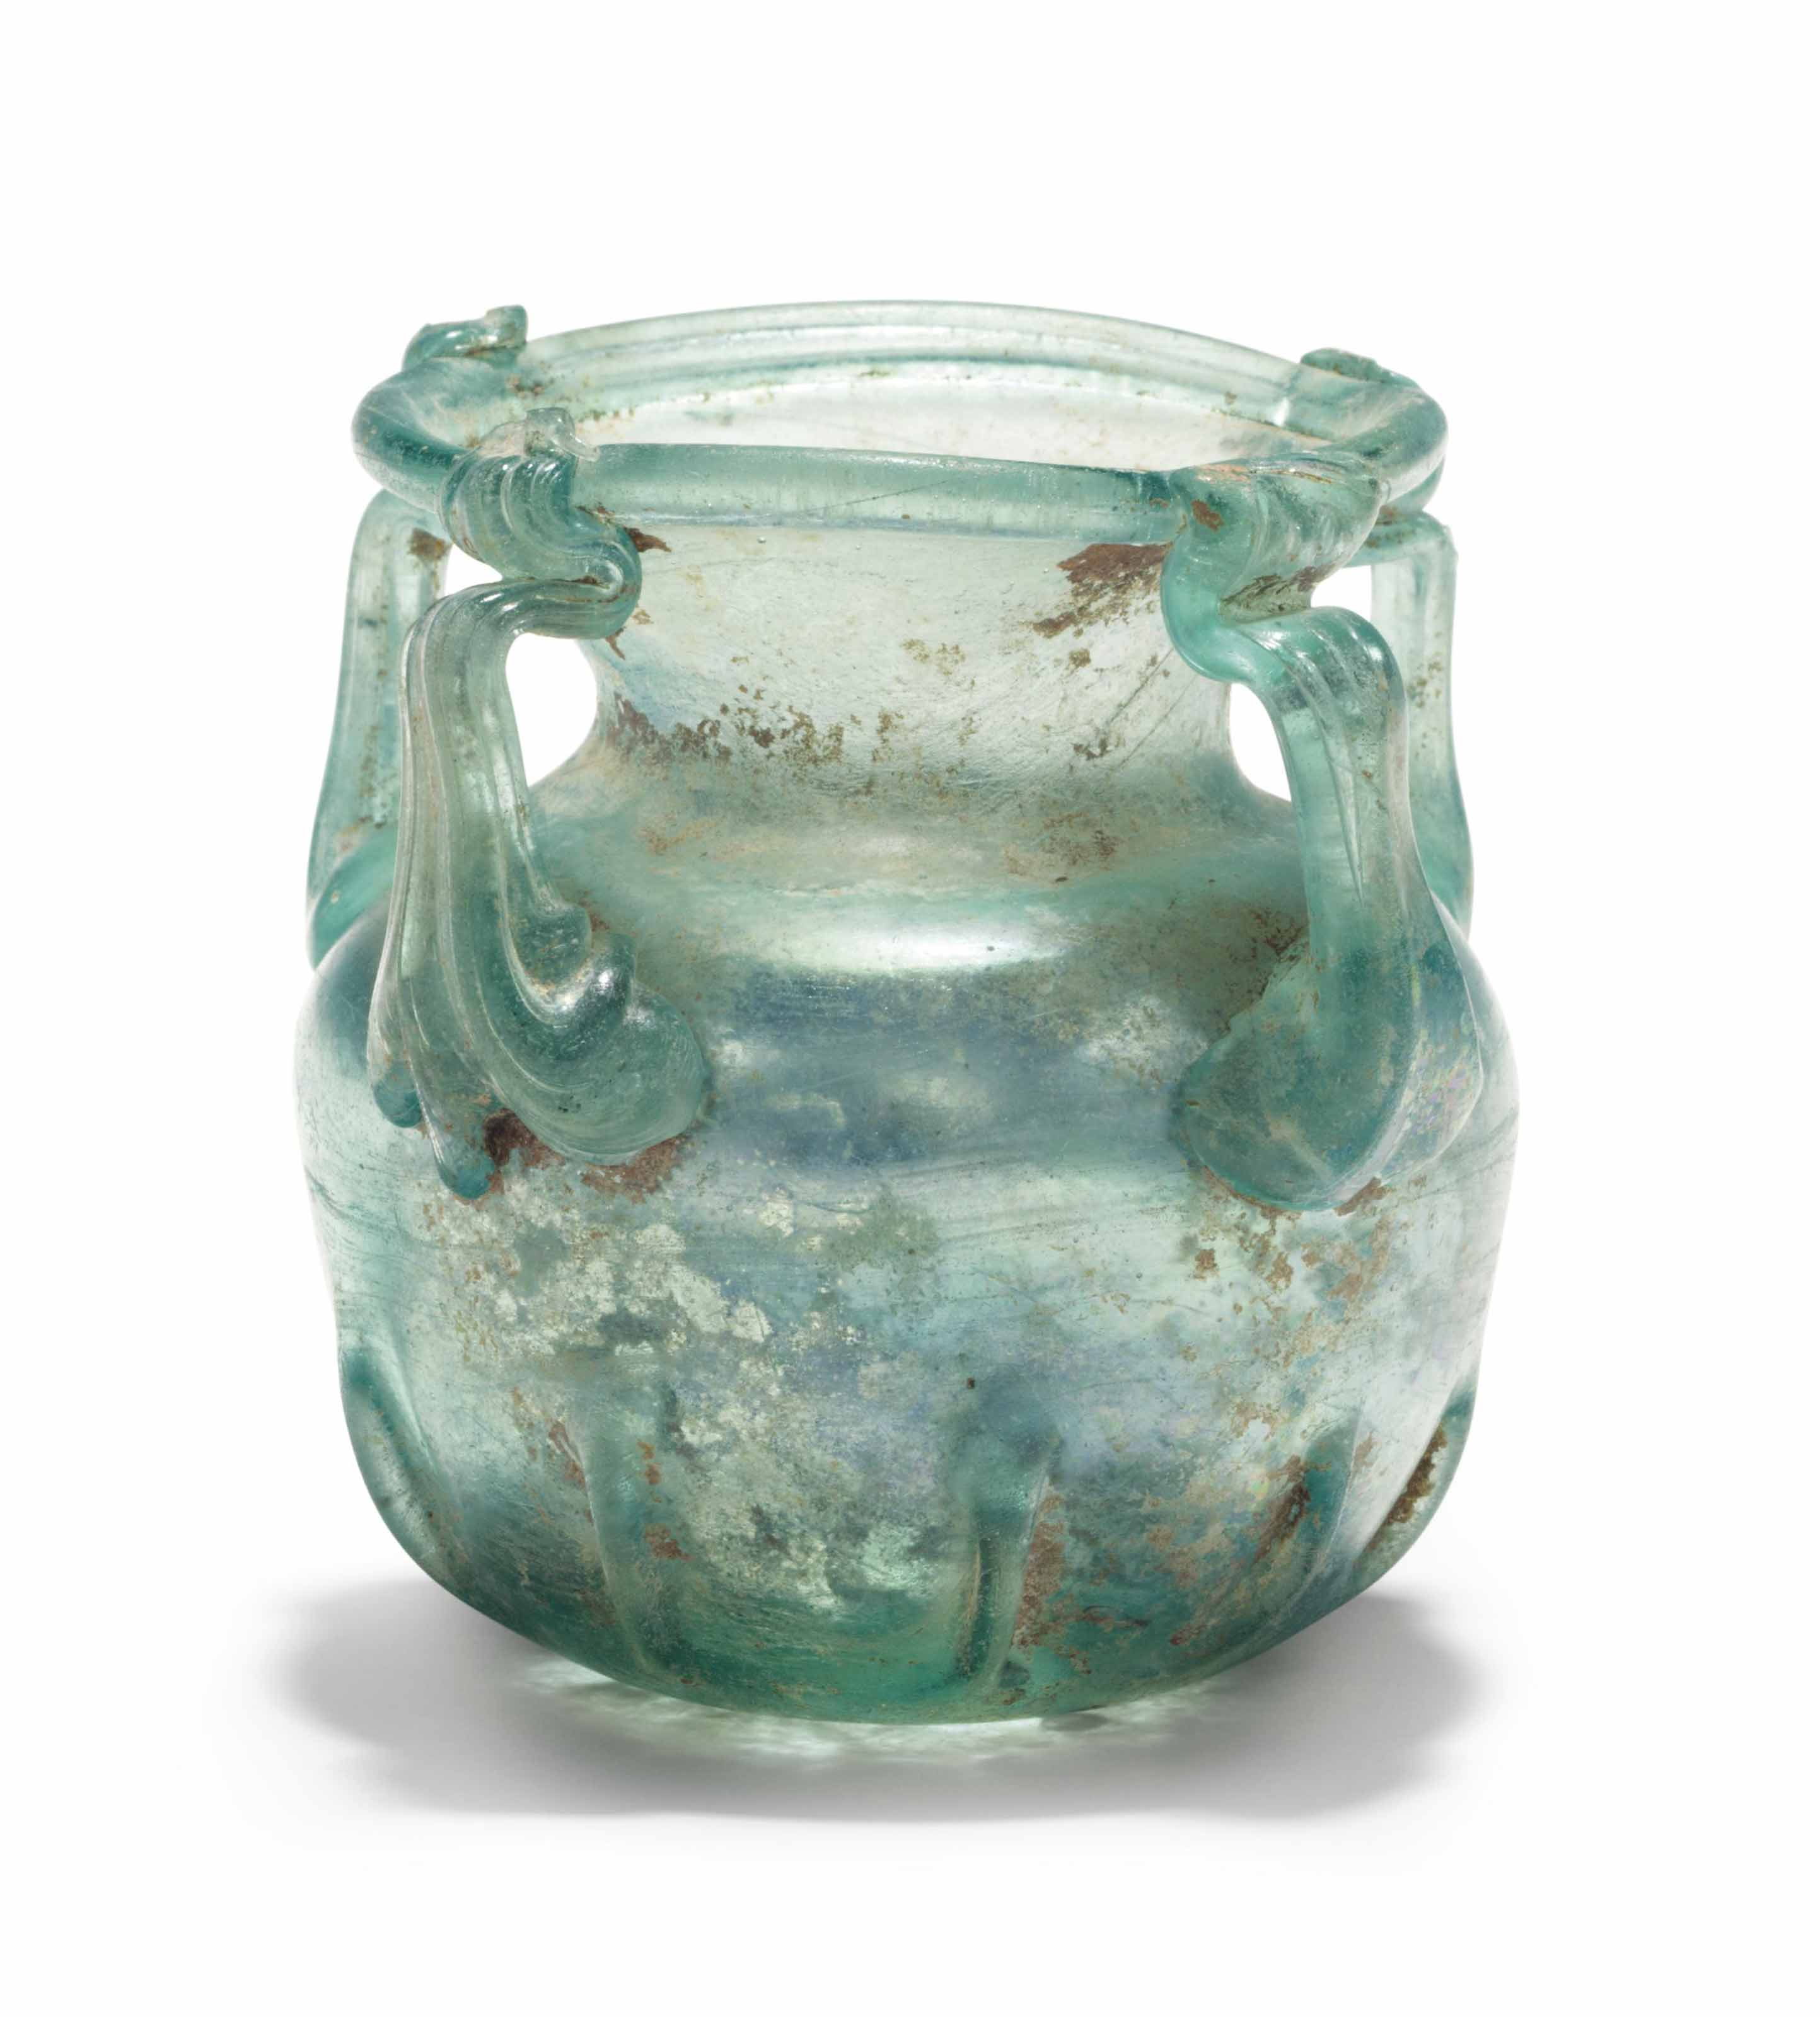 A LATE ROMAN GLASS FOUR-HANDLED JAR